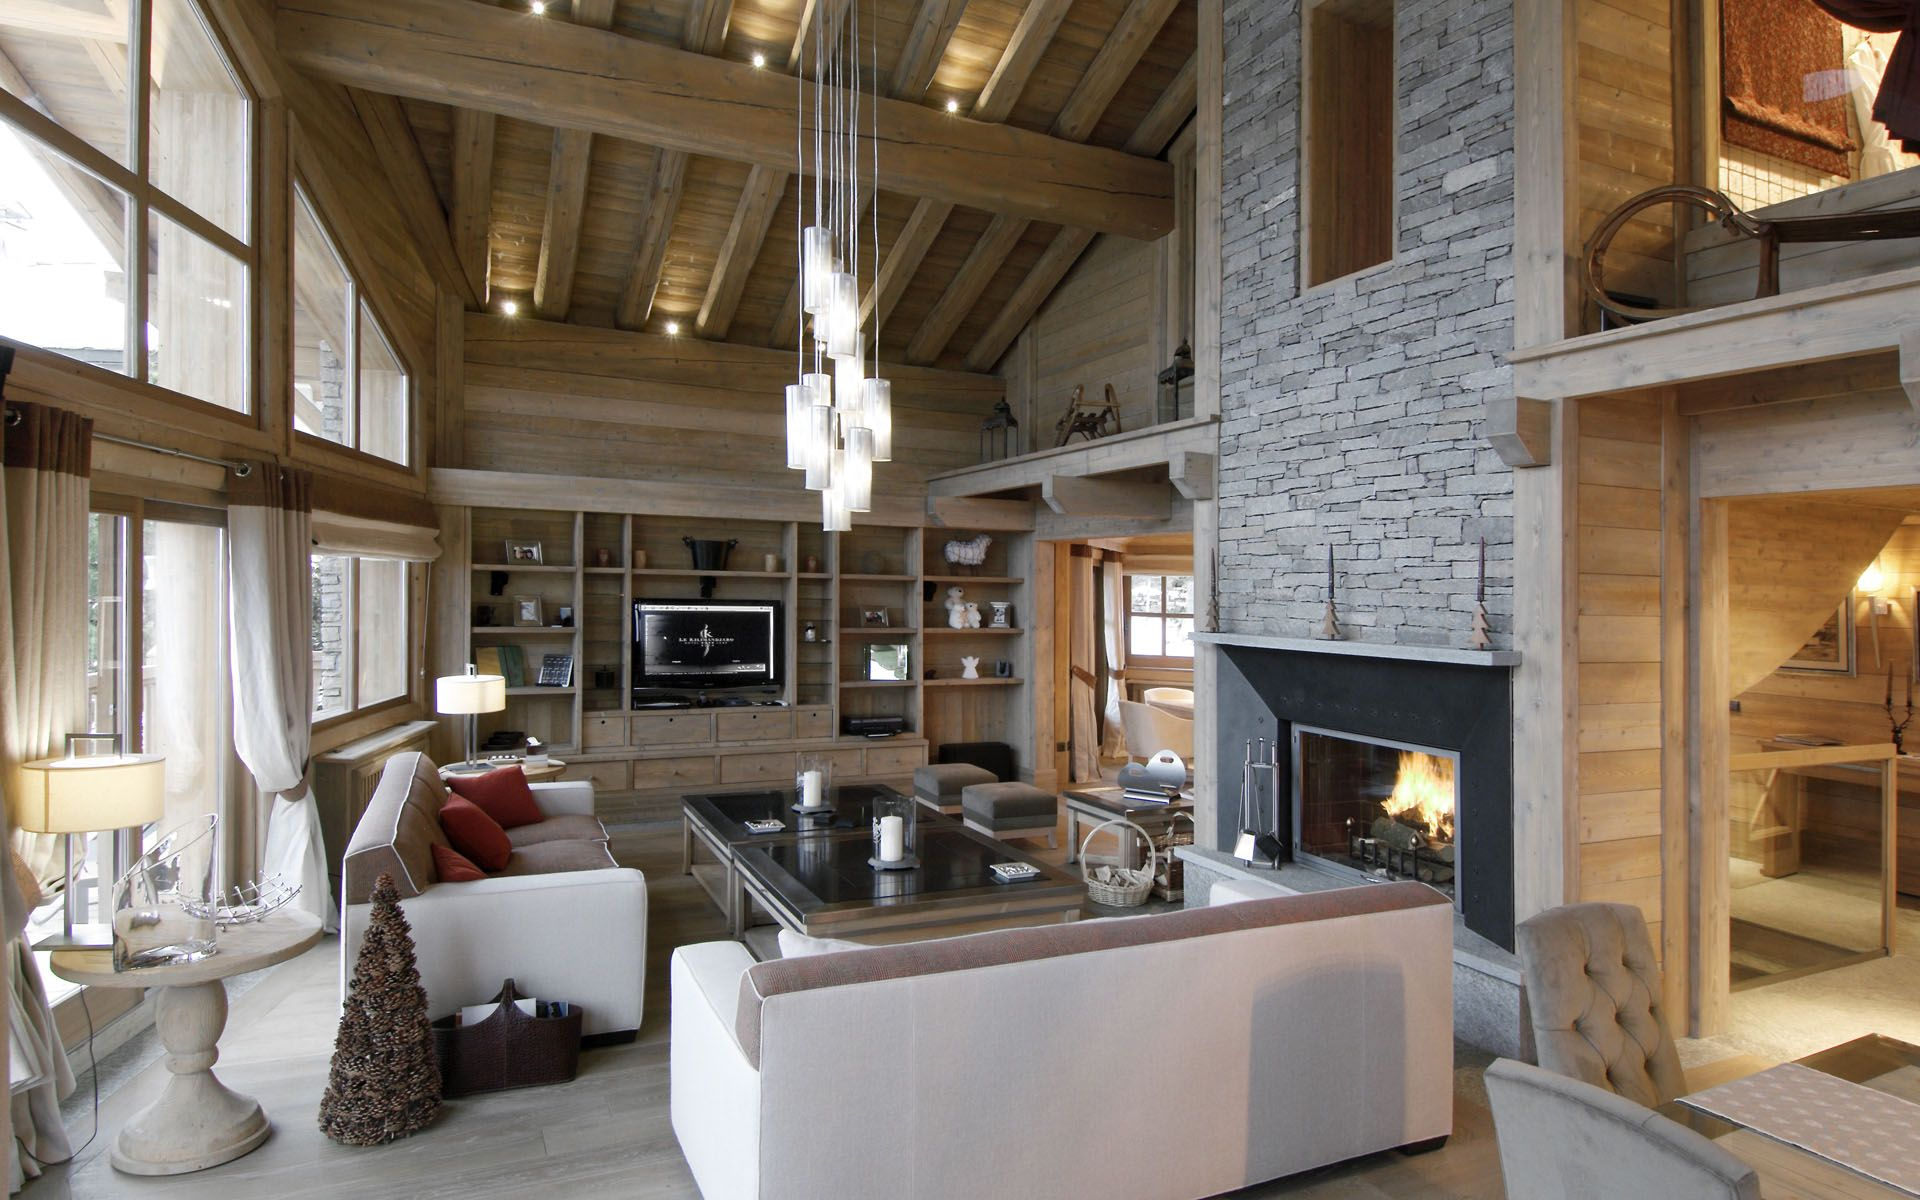 Mountain retreat interior design google search chalet for Innendekoration chalet